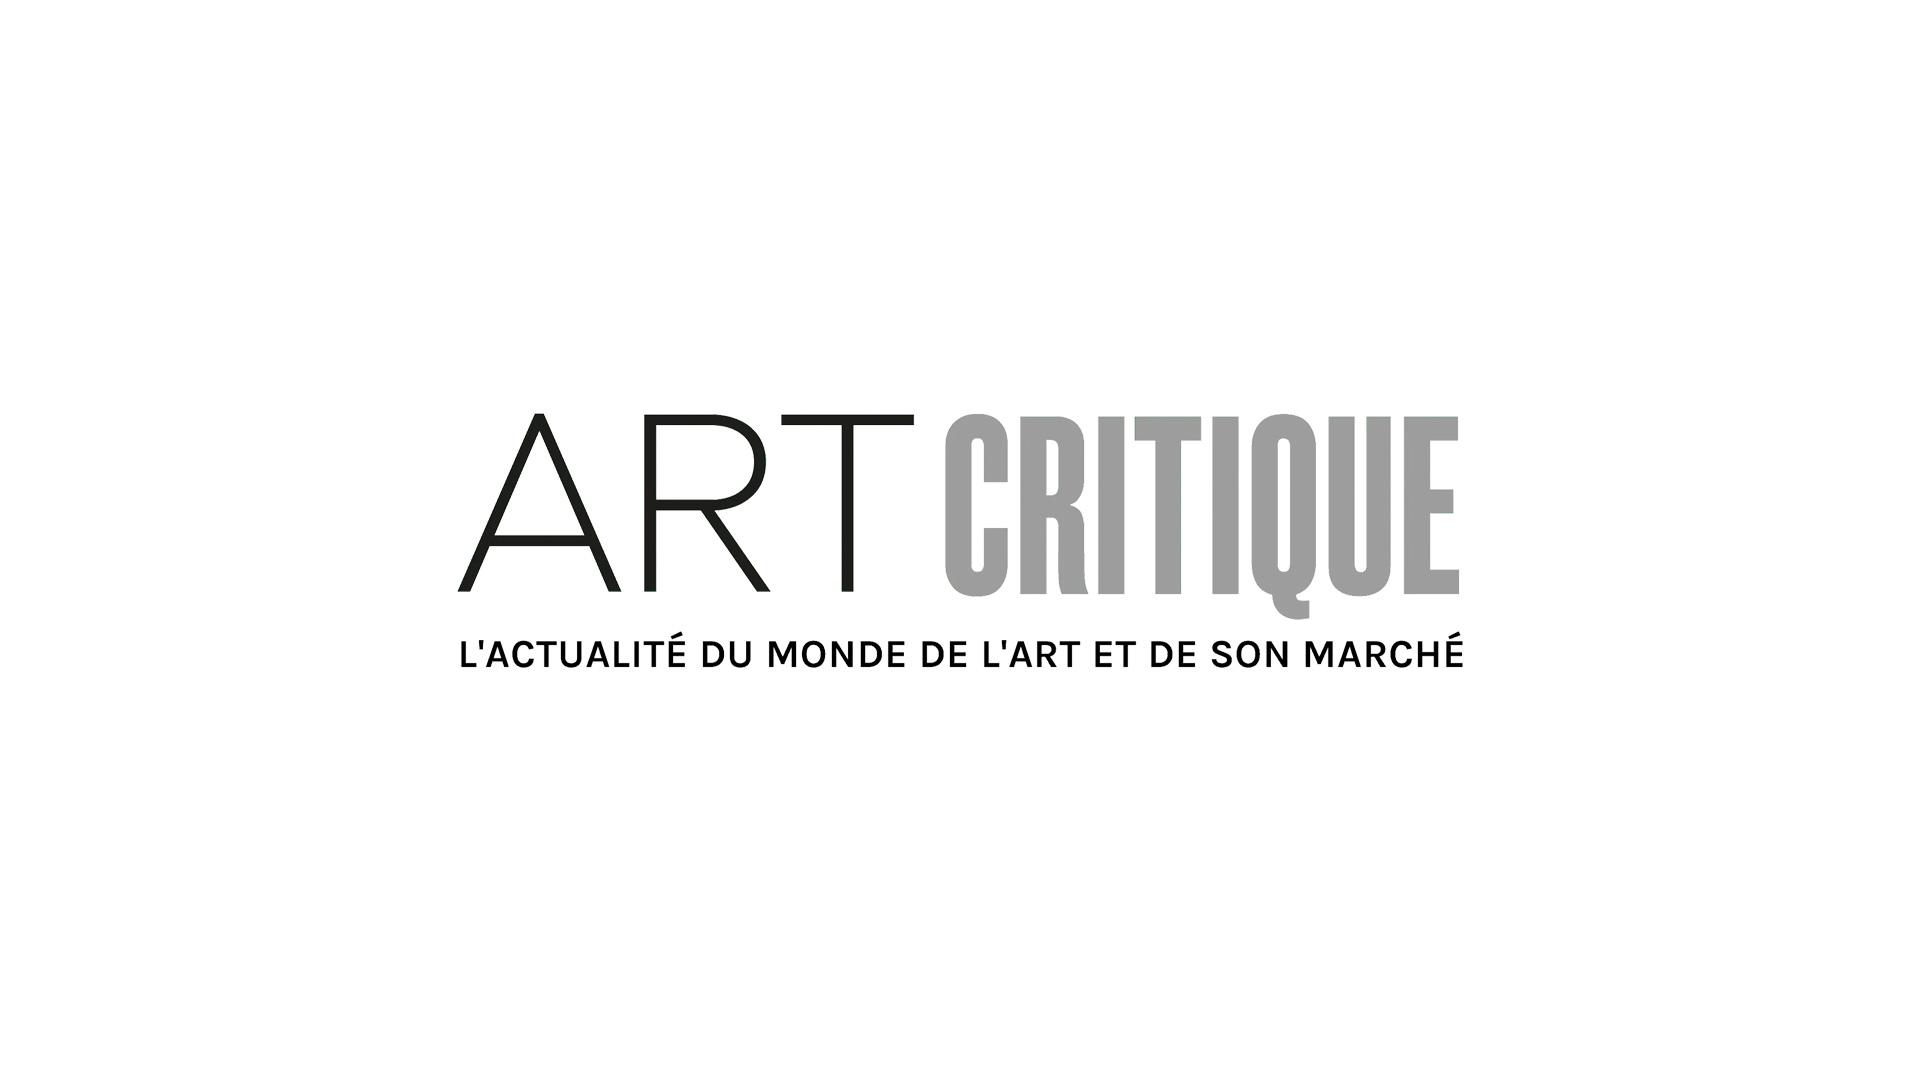 Les œuvres disparues de Giacometti